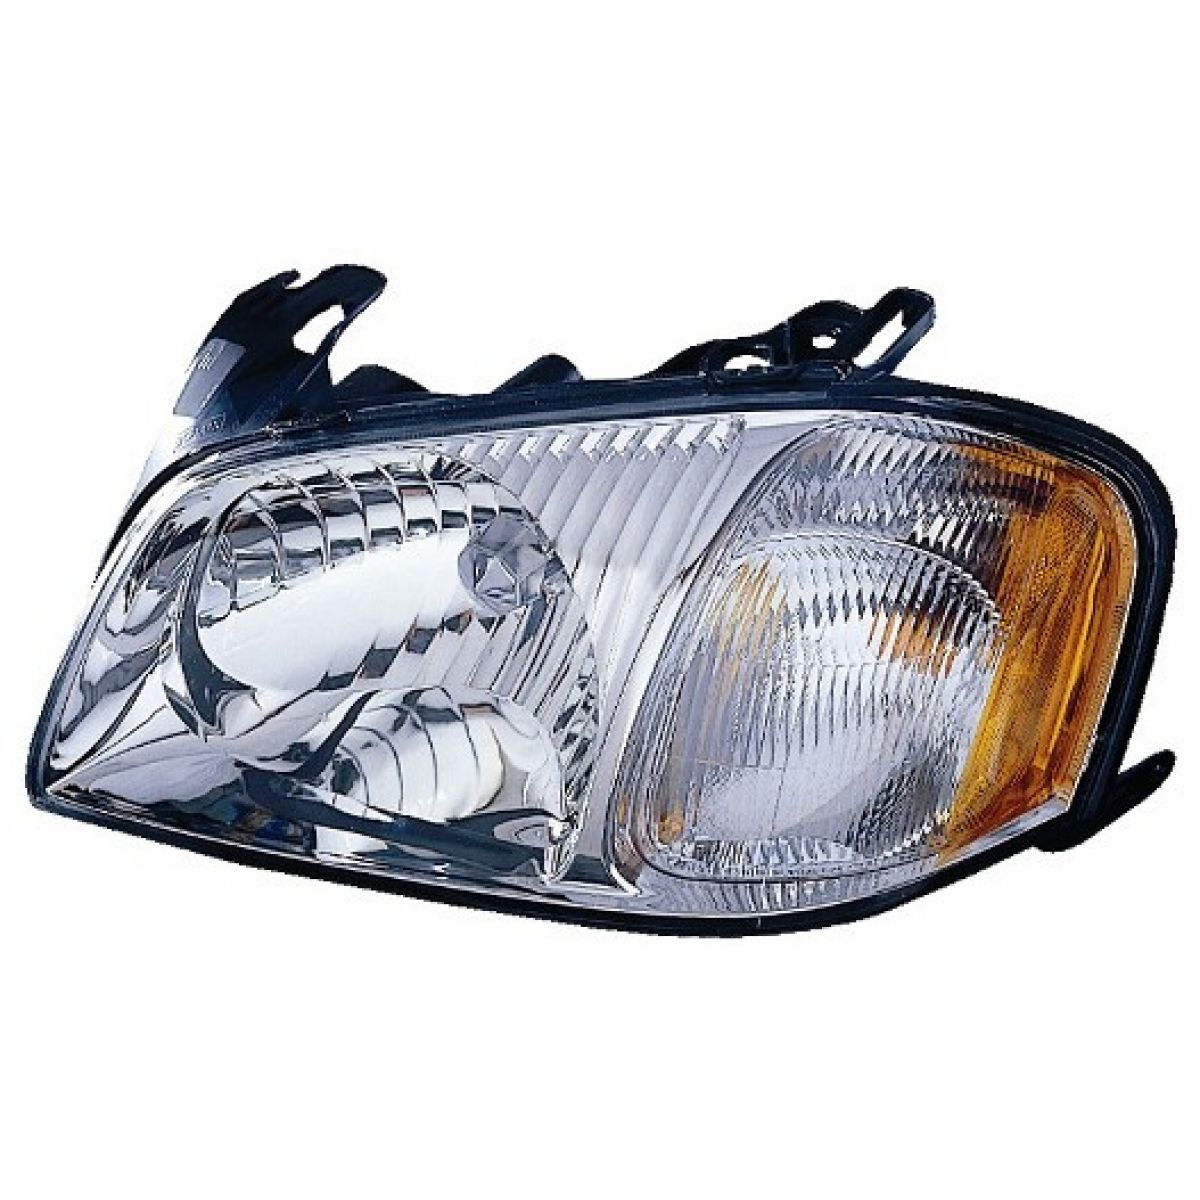 Headlight Headlamp Driver Side Left LH NEW for 04-05 Dodge Durango